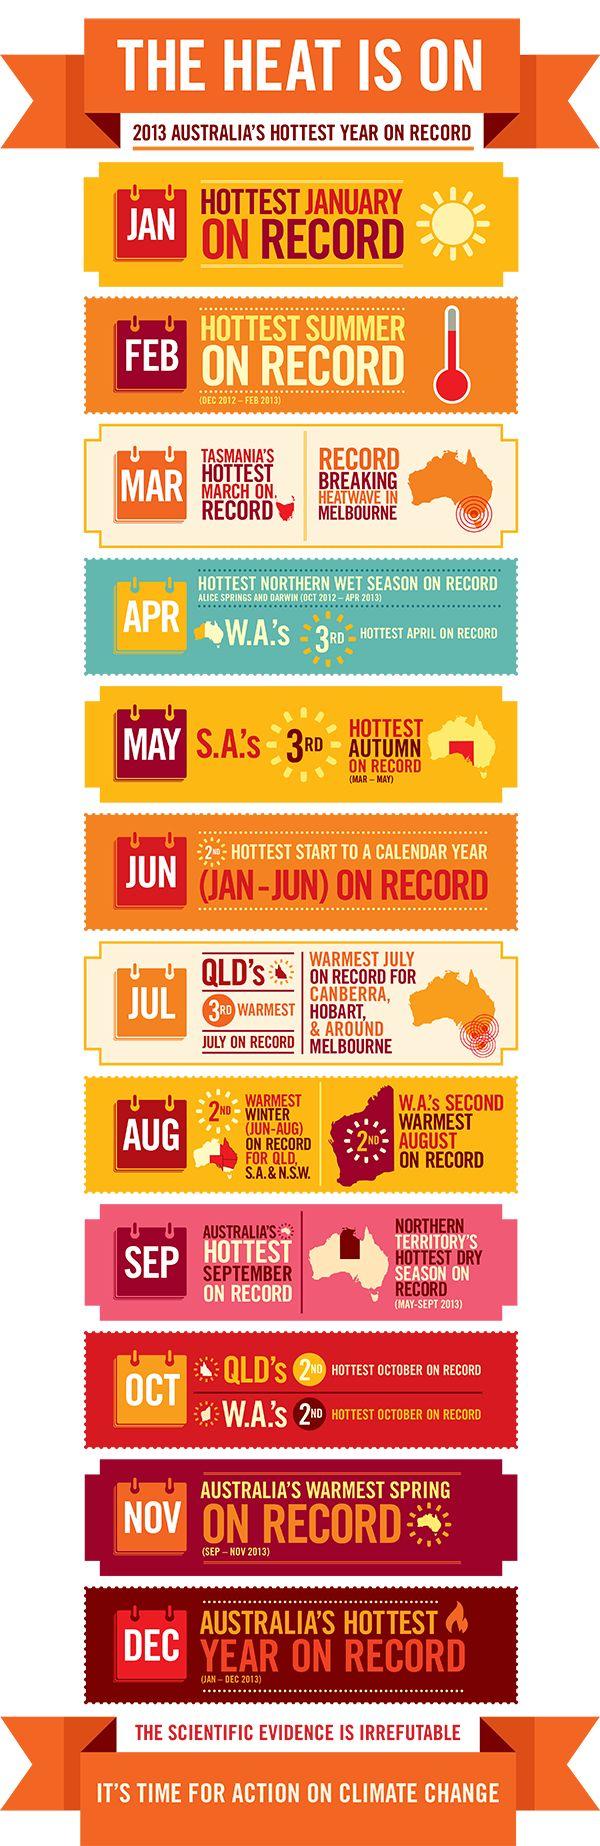 Hottest days on record in Australia 2013 #Australia #movingtoAustralia